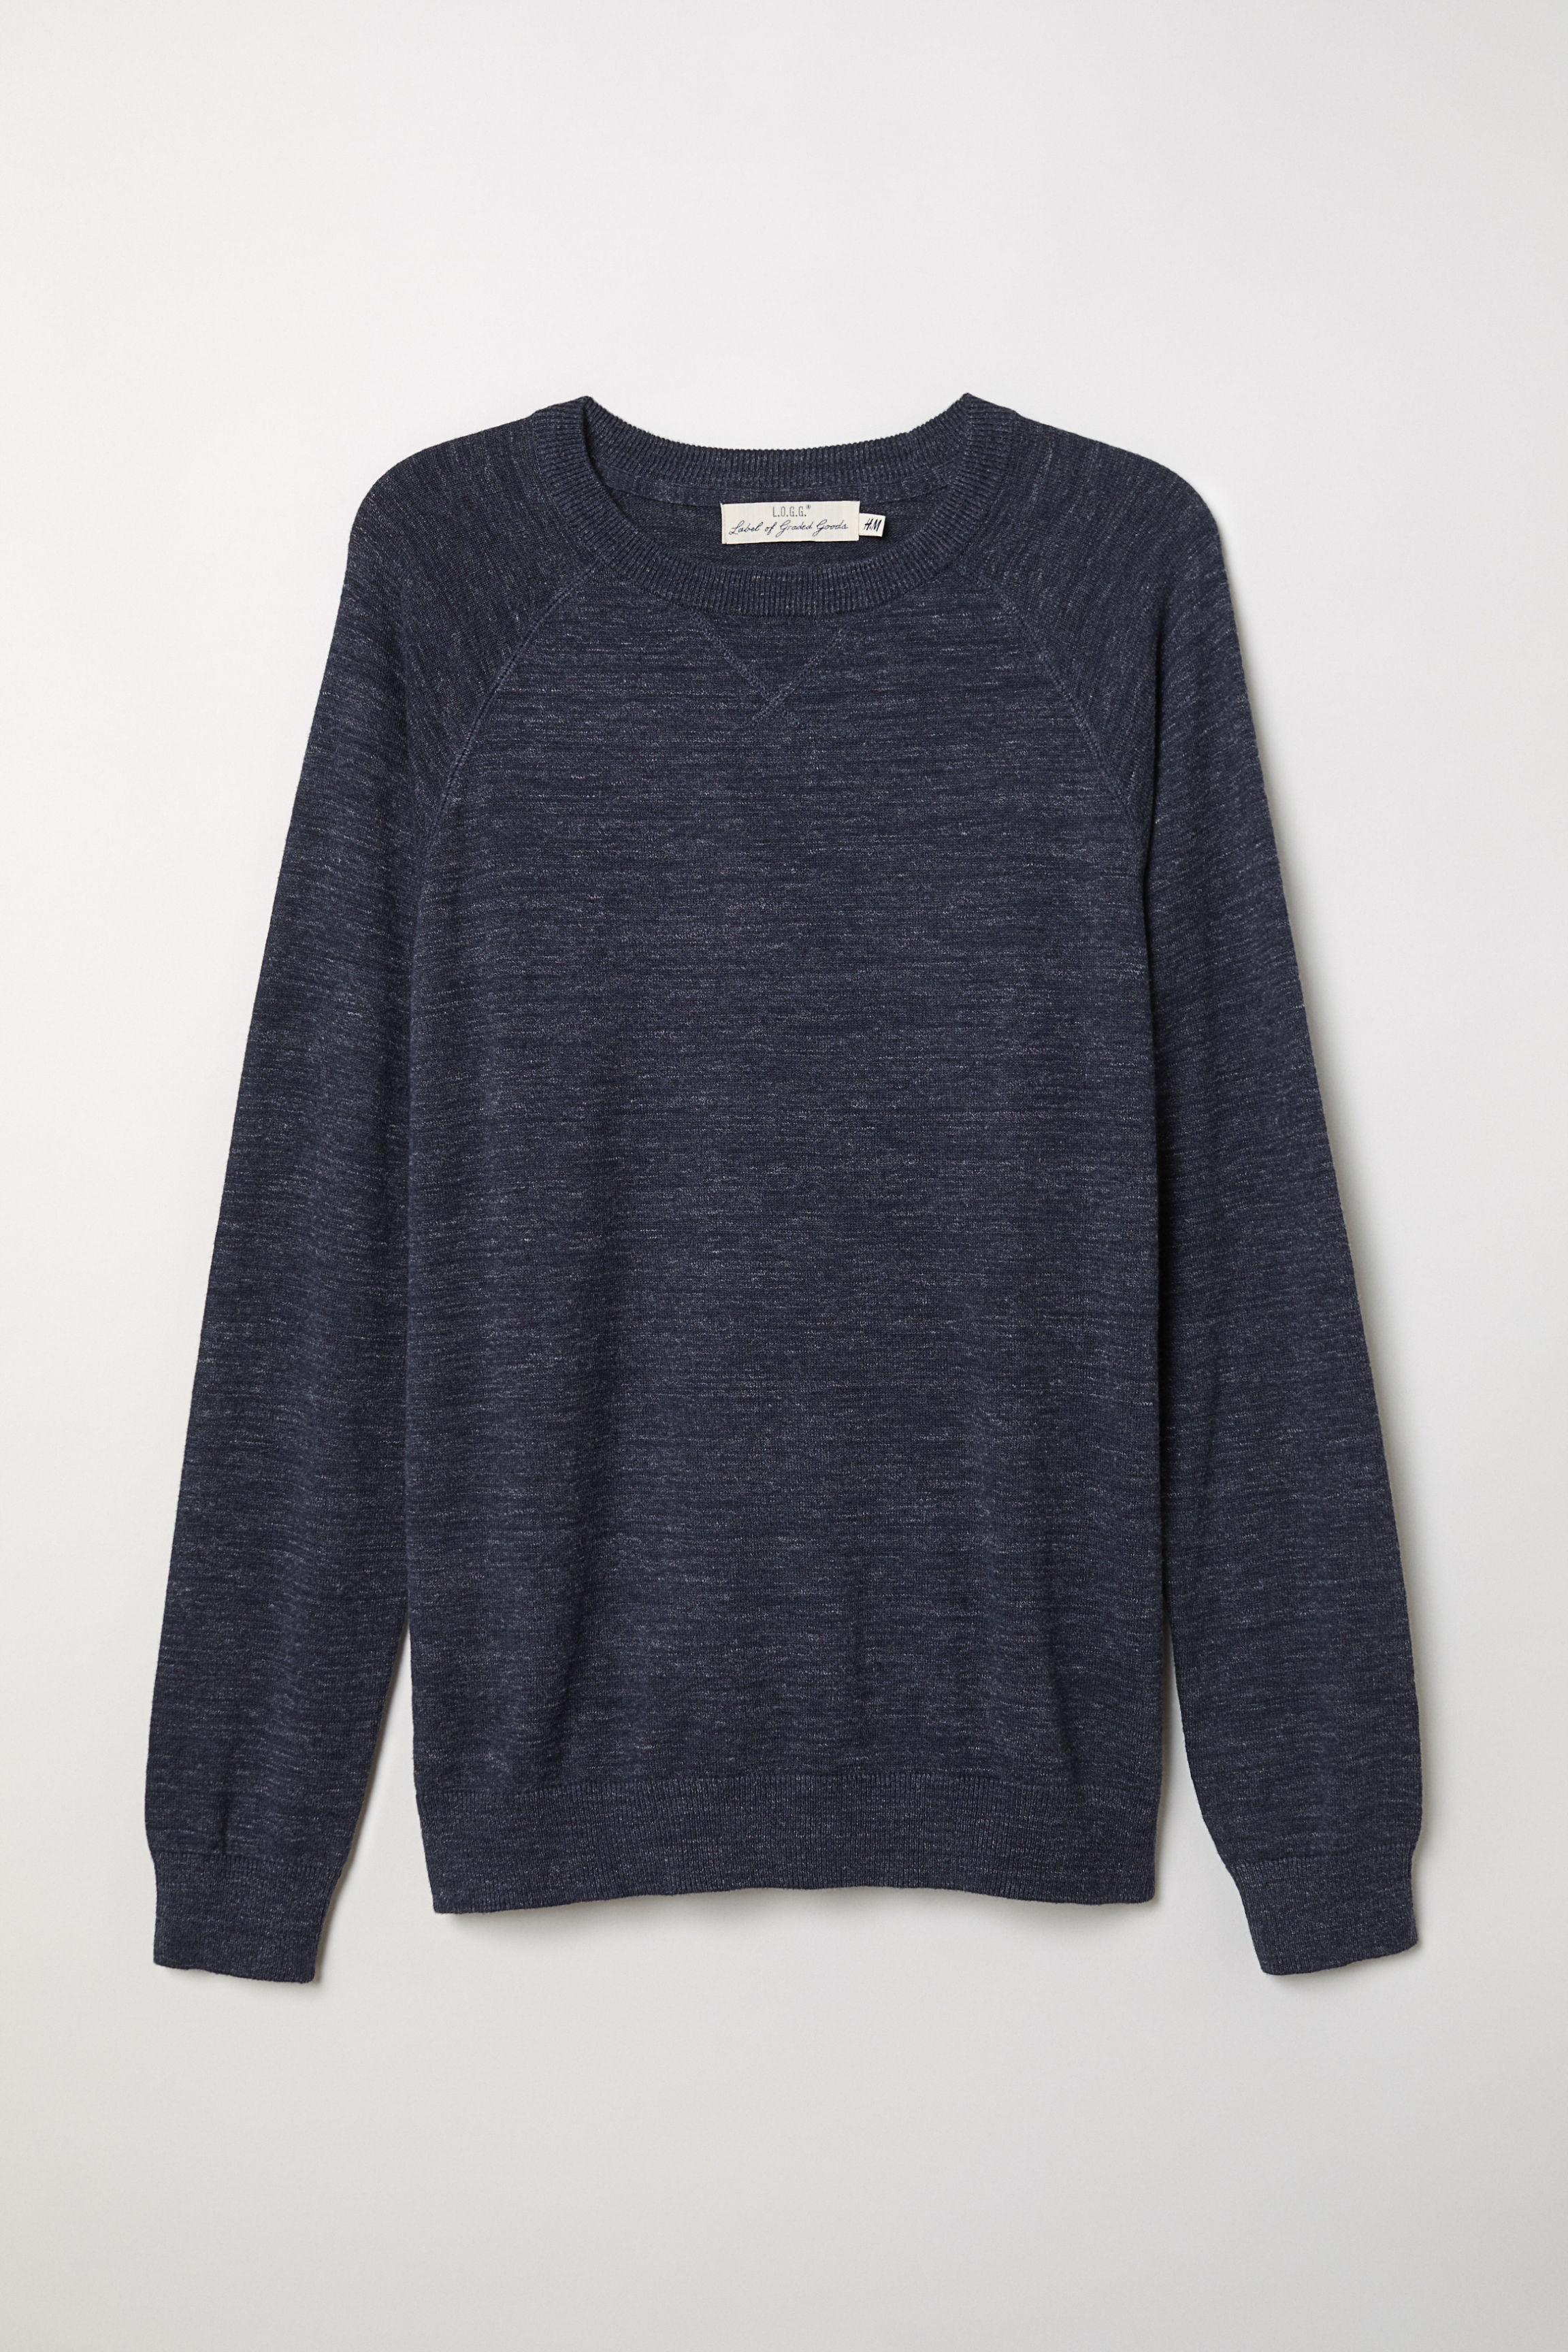 0affb232d6221 Cotton Raglan-sleeved Sweater - Gray melange - Men | H&M US